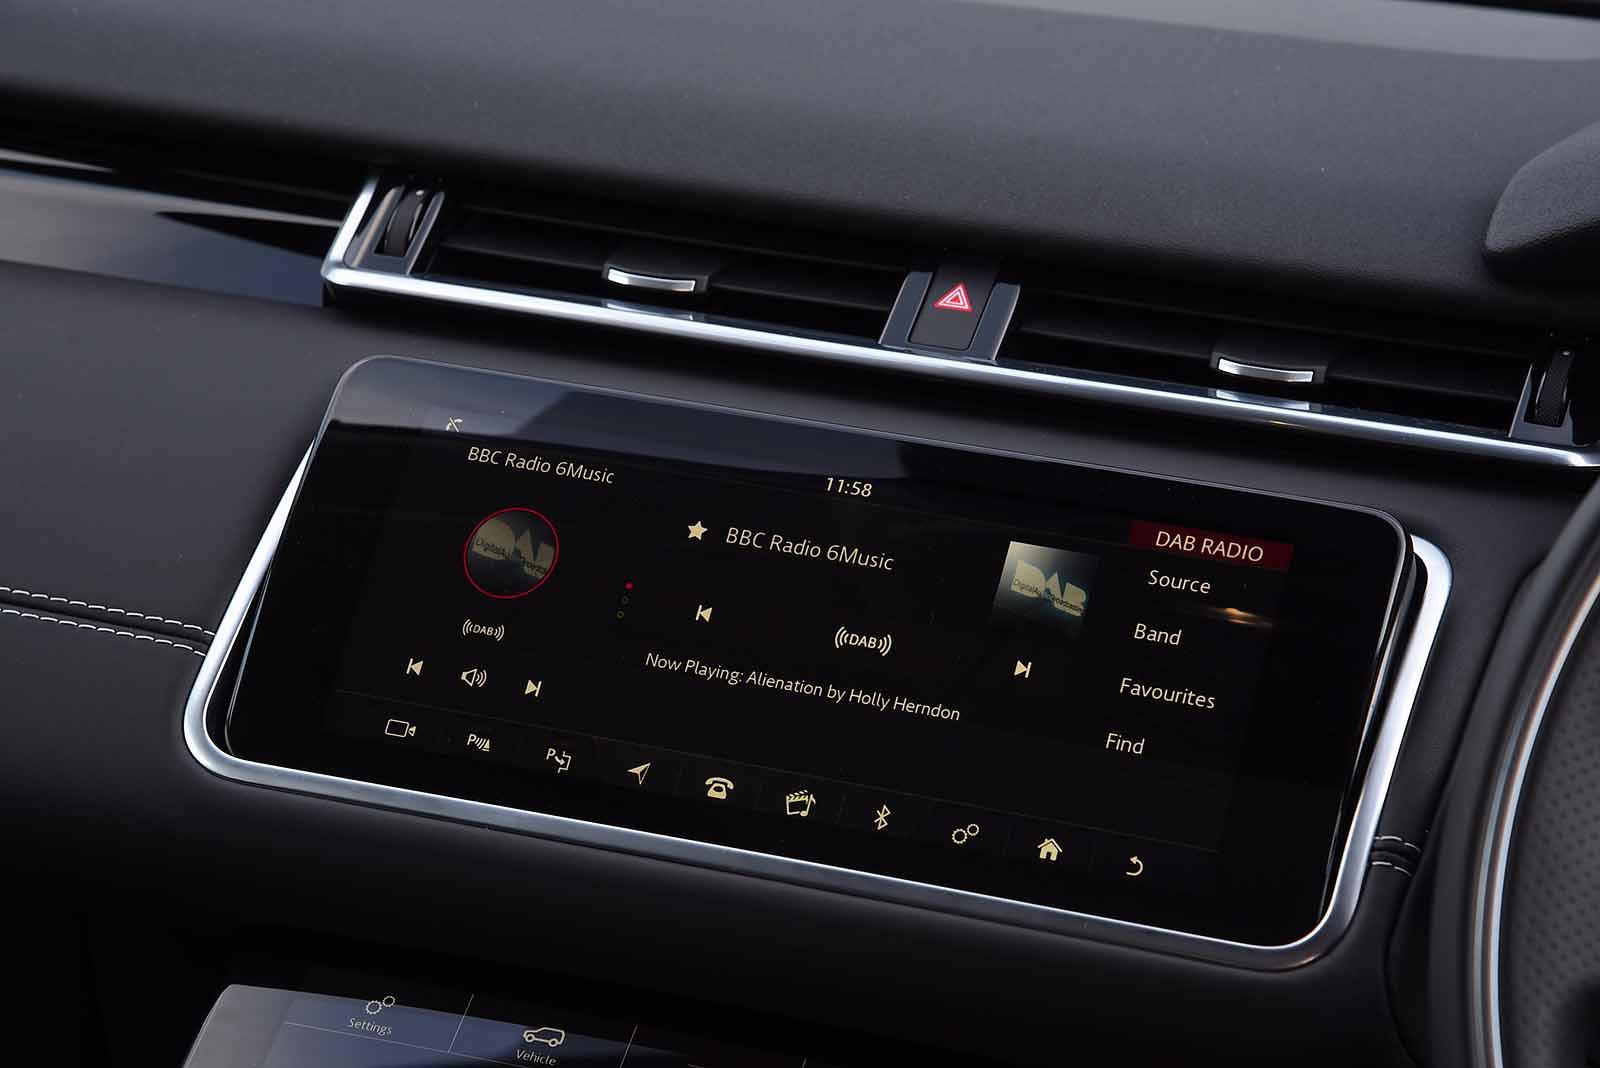 Land Rover Range Rover Velar 2019 RHD infotainment